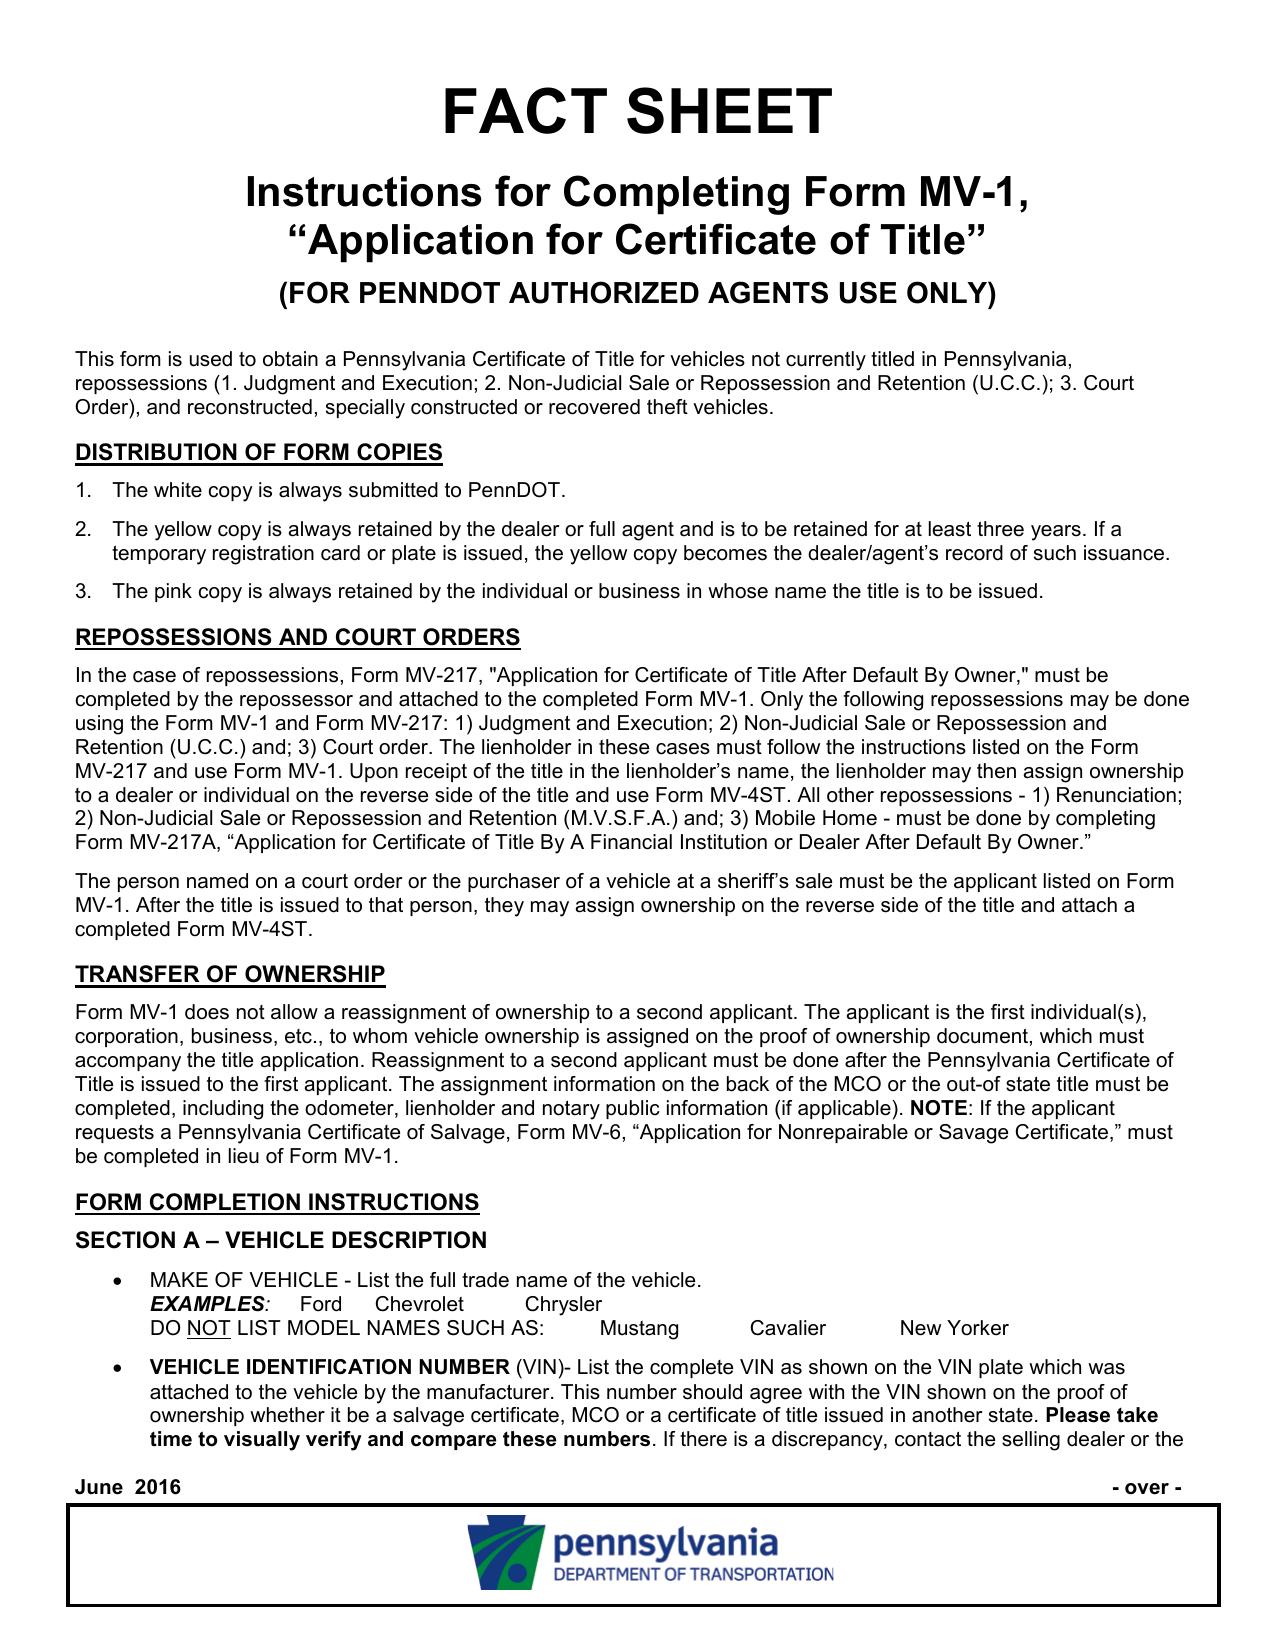 Honda Tmx 155 Manual By Matthew Tobin Anderson Penndot Fact Sheet  Instructions Forpleting Form Mv 1